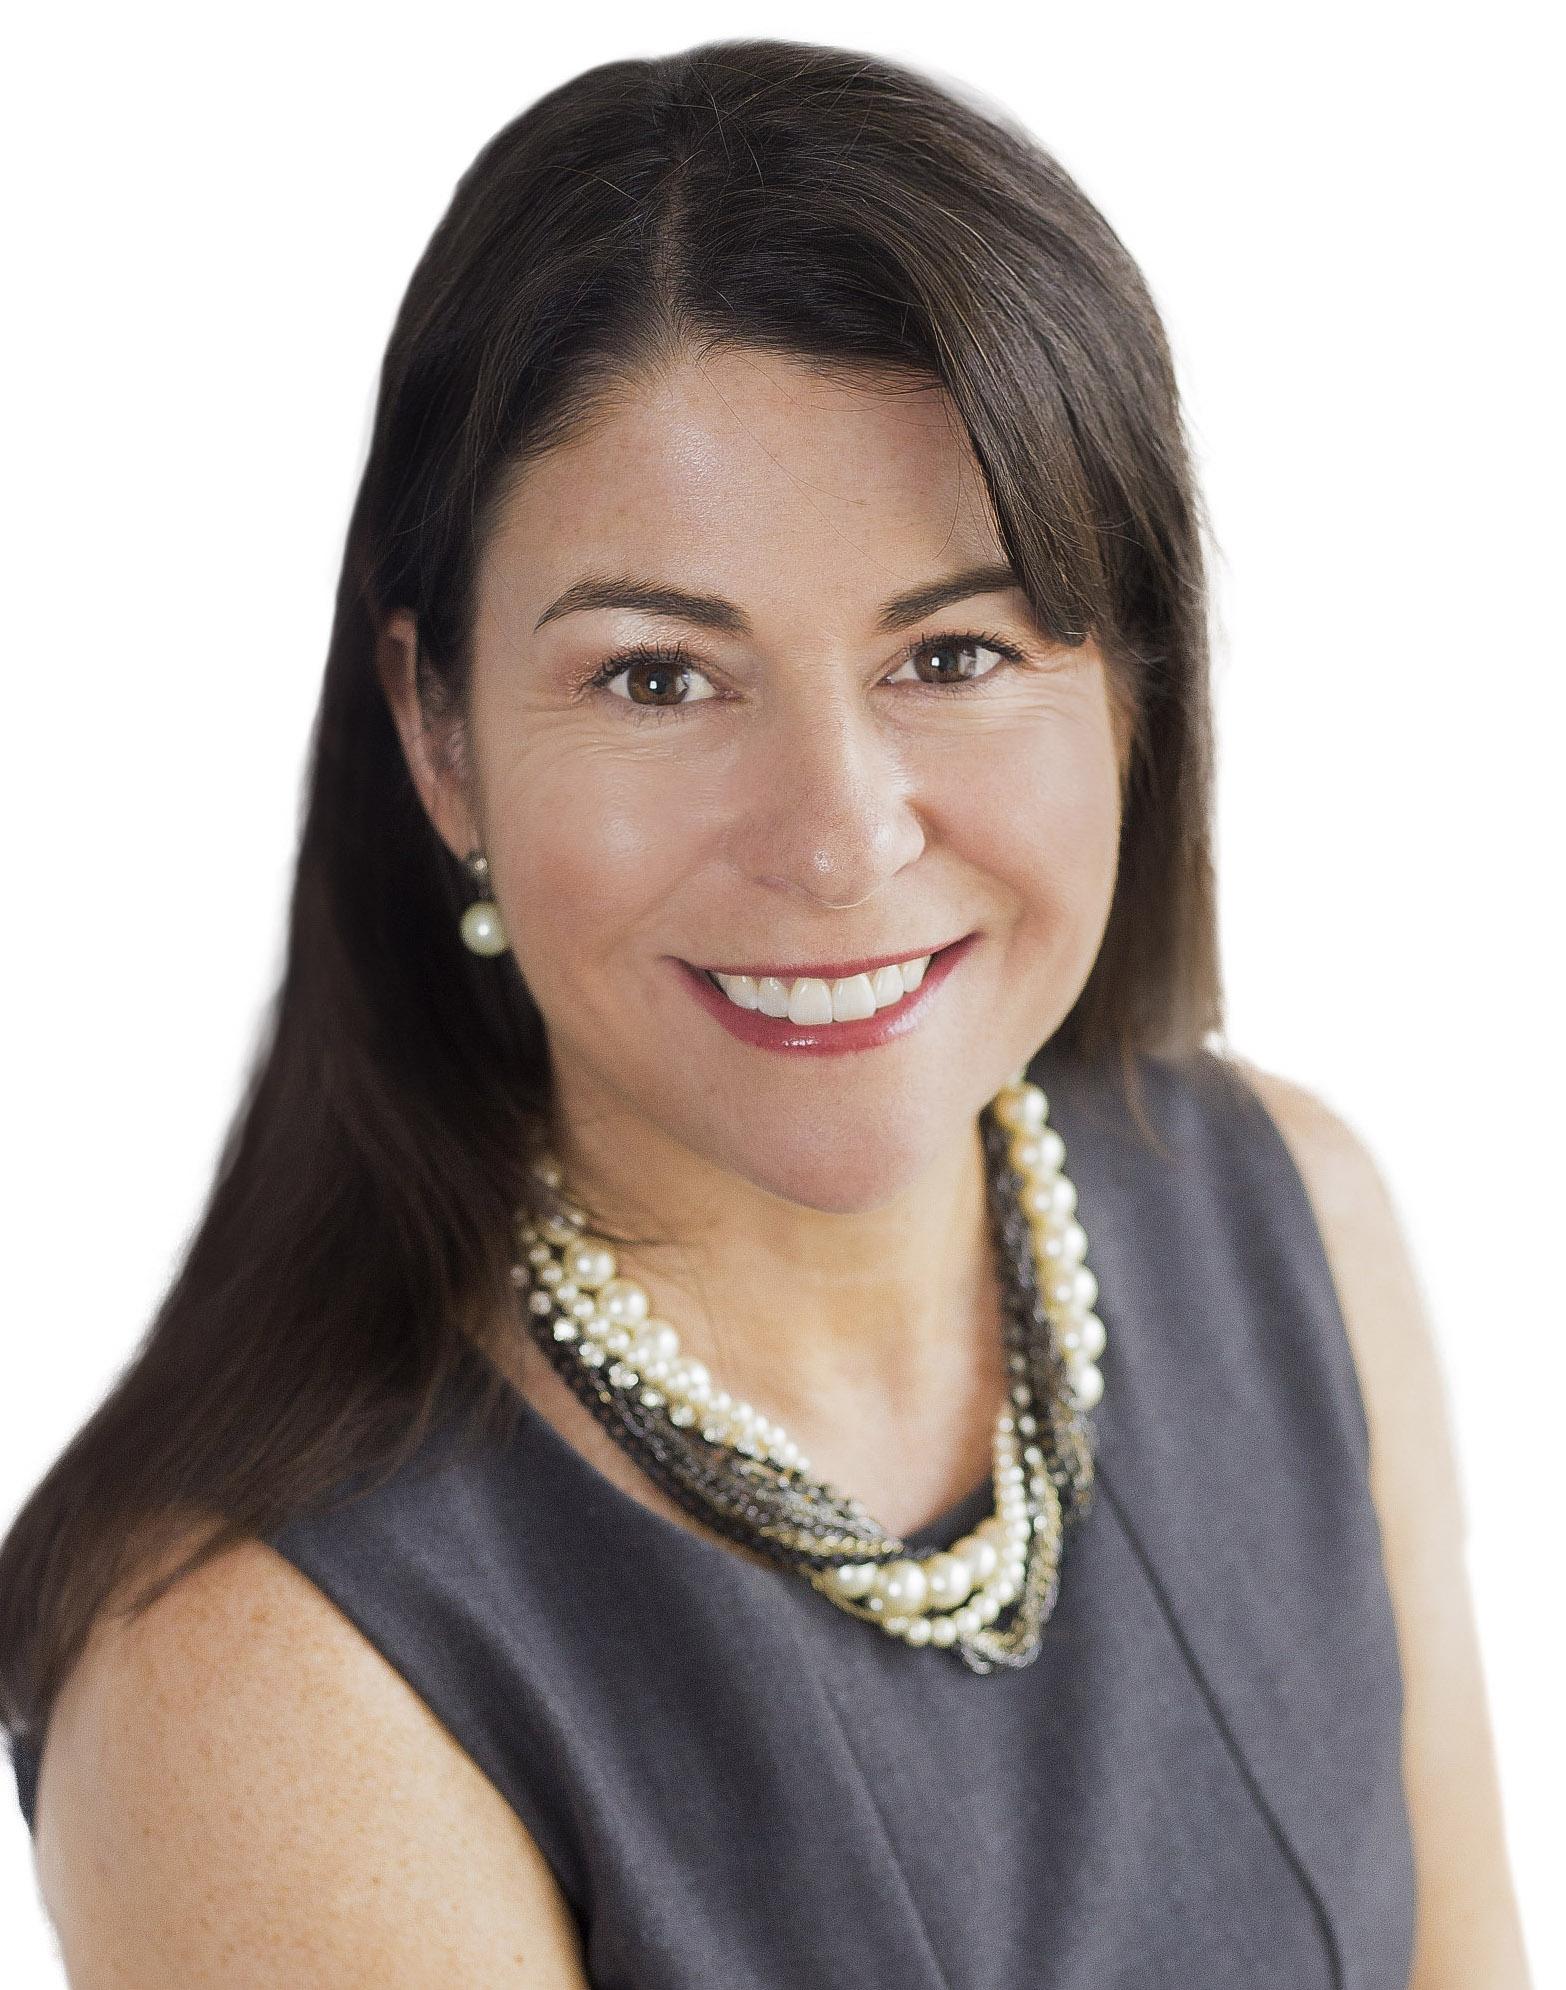 Victoria Stultz